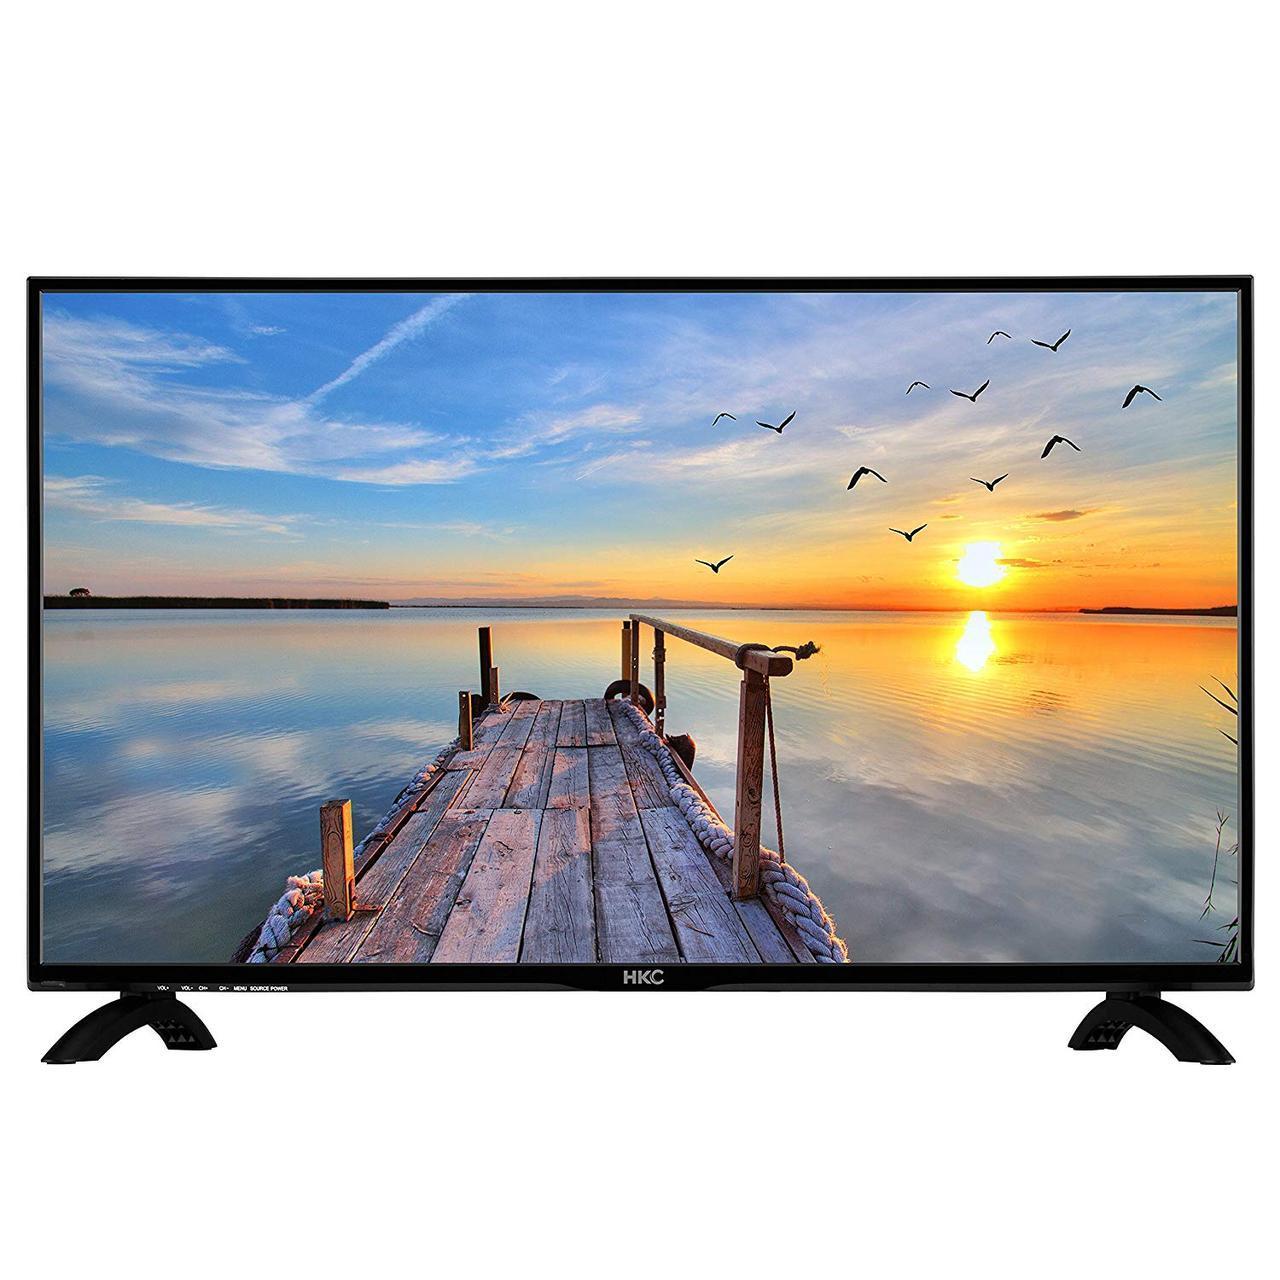 Телевізор HKC 43F6-A2EU (43 дюйми, Full HD, 1000 Гц, HDMI,USB)